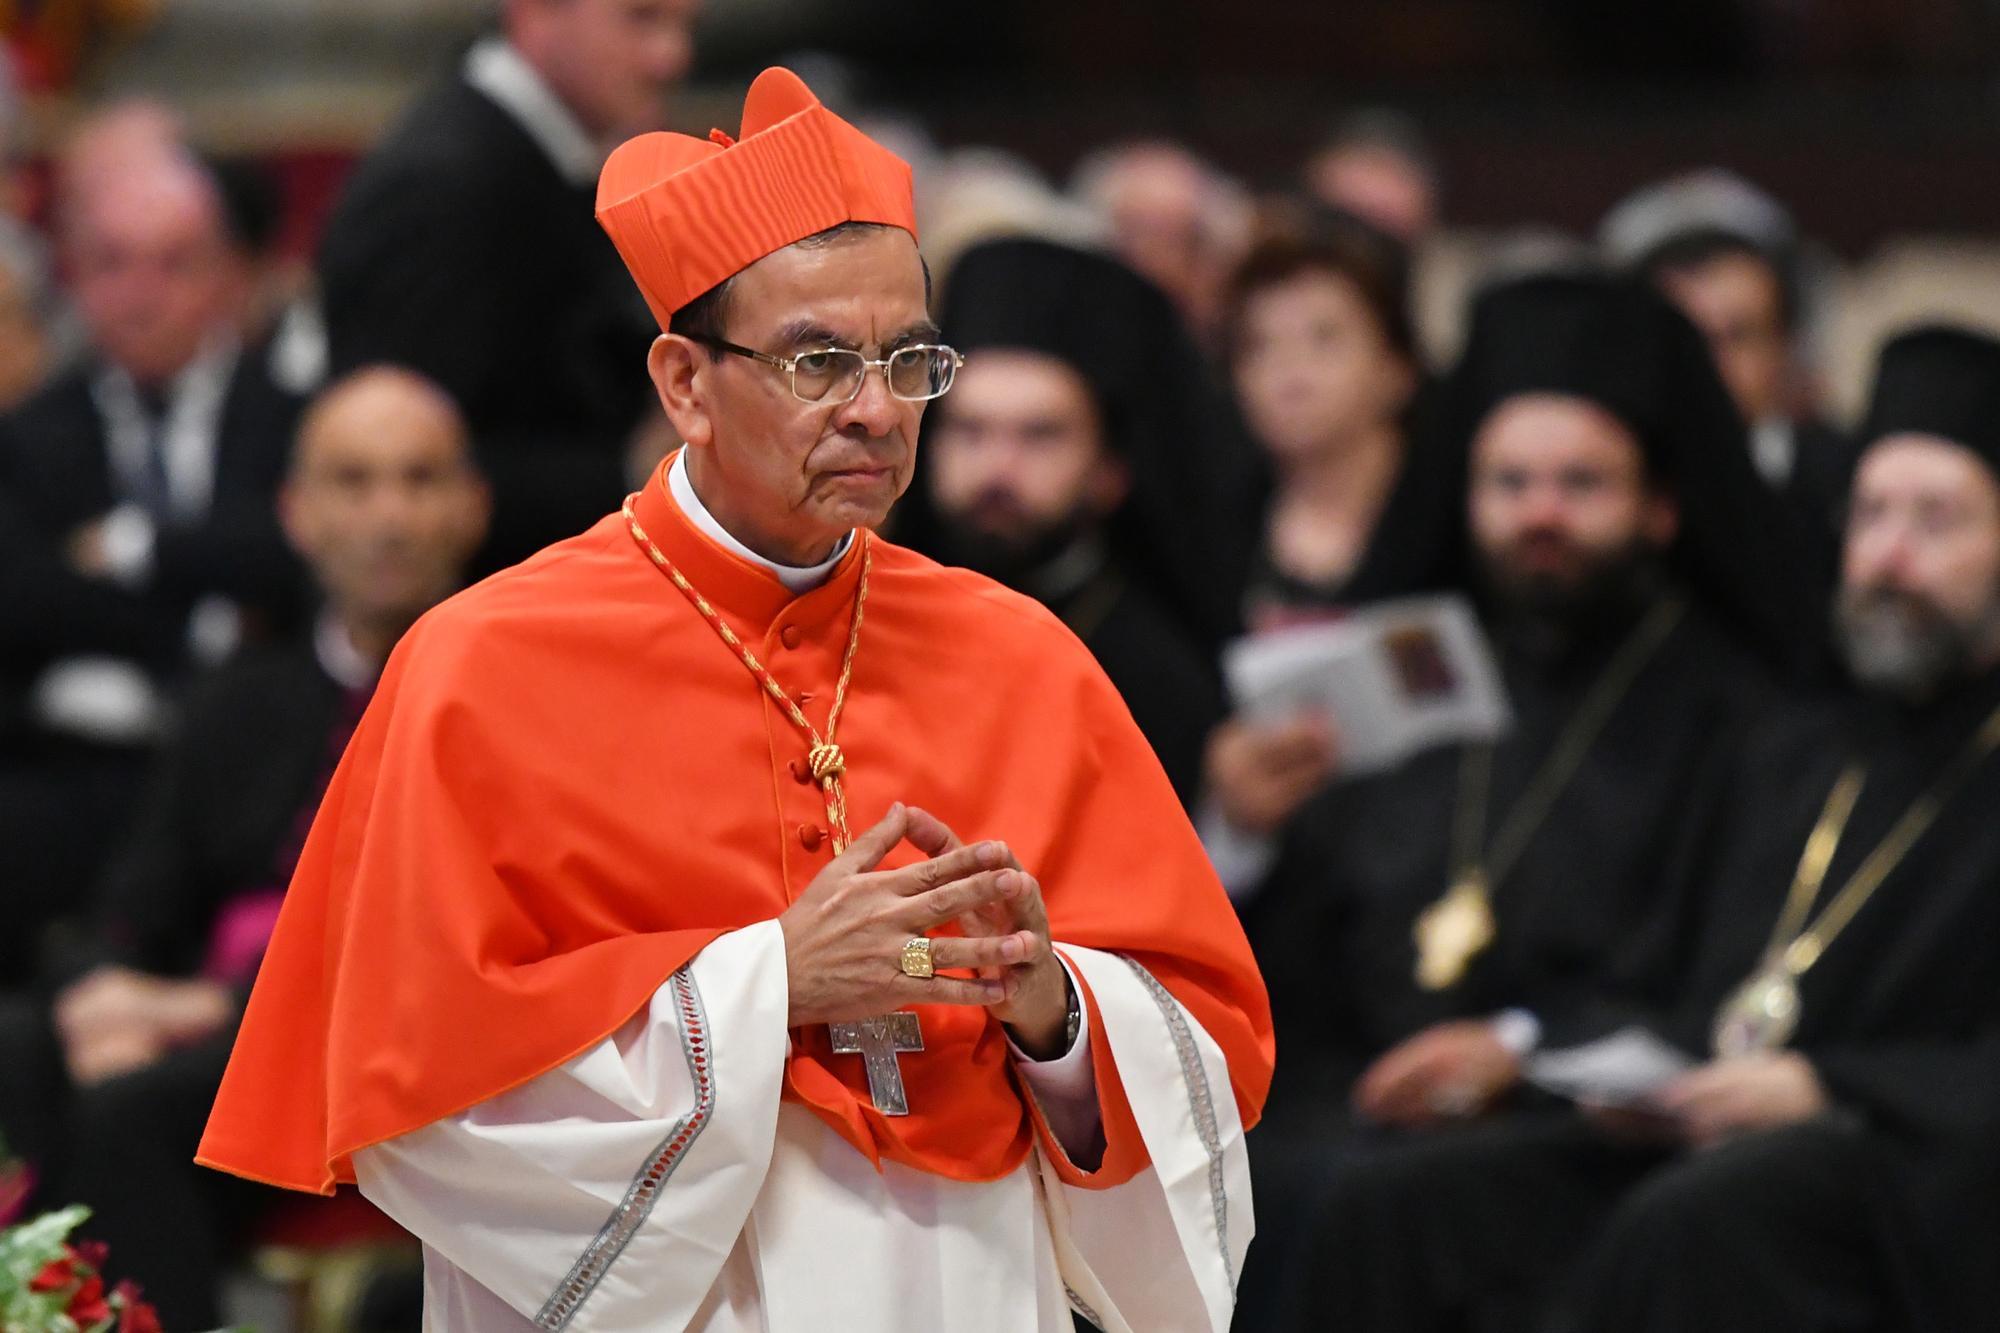 Cardenal Rosa Chávez está en cuarentena